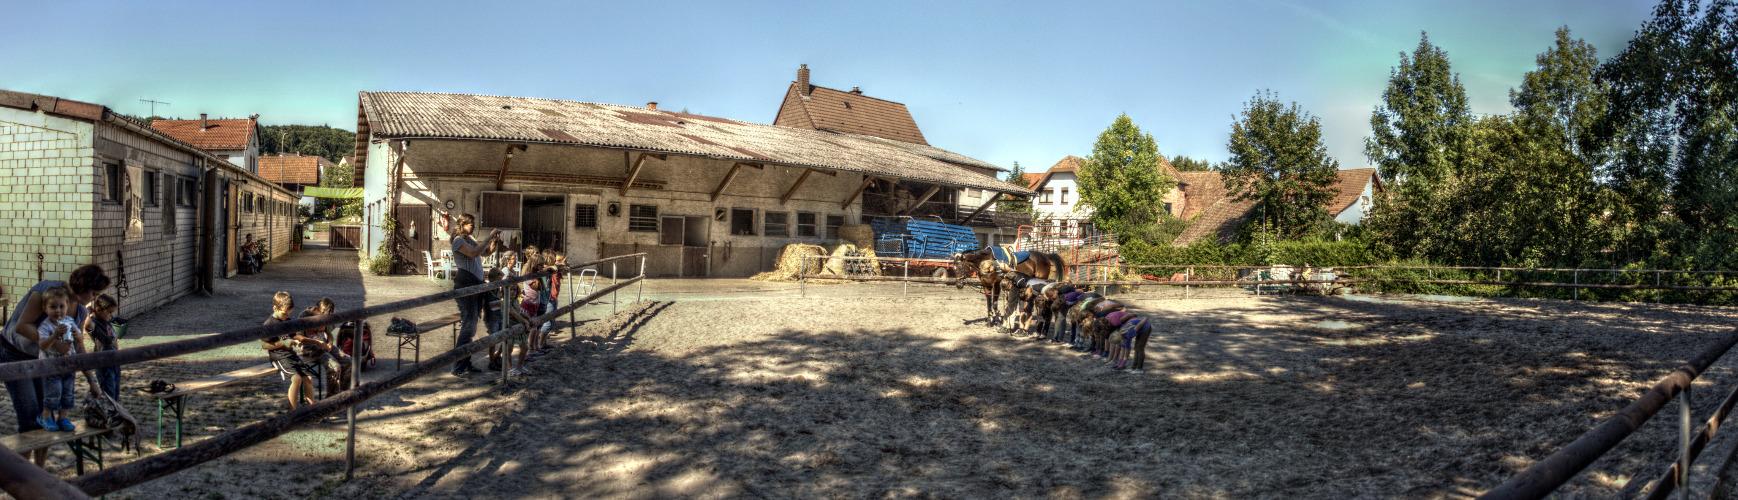 Pferdehof Ziegler, Wiesenbach